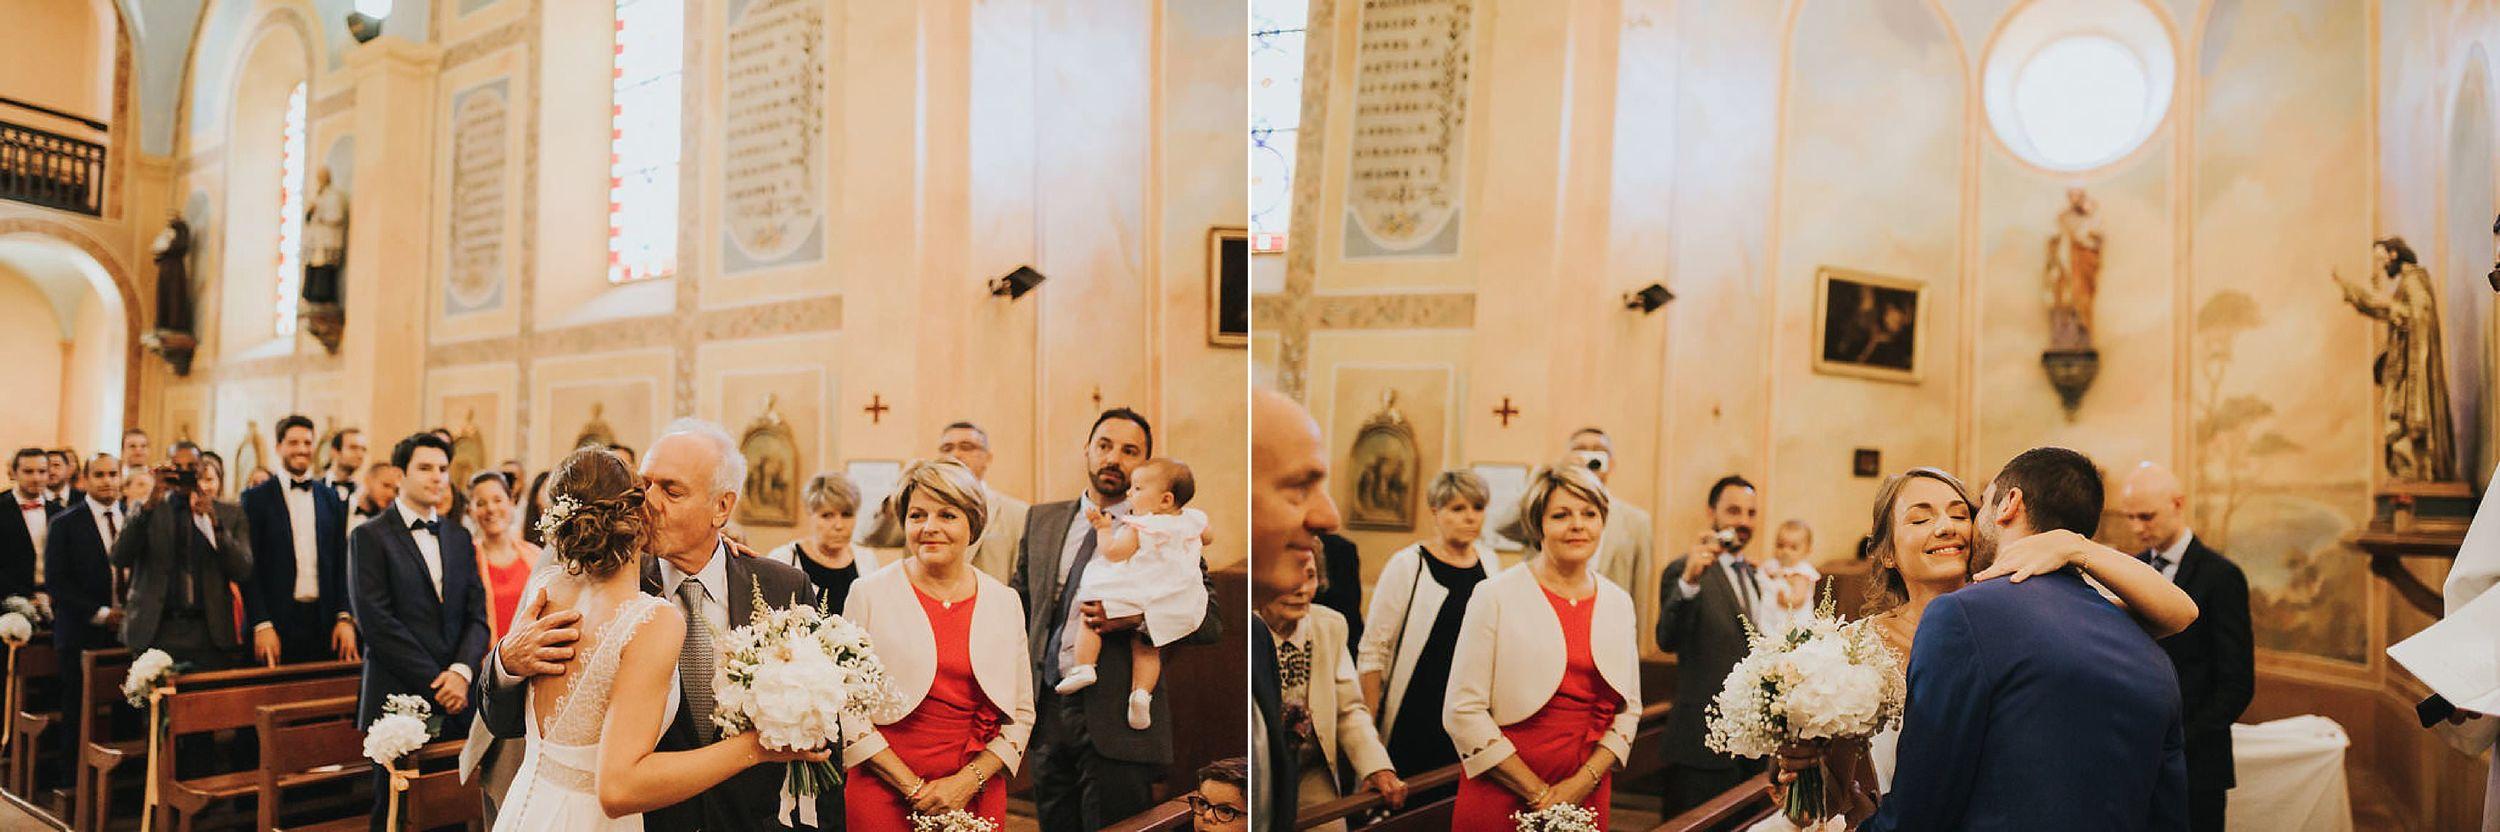 mariage-hyeres-villa-brignac-steven-bassillieaux-bordeaux-dordogne-wedding-photographe88.jpg